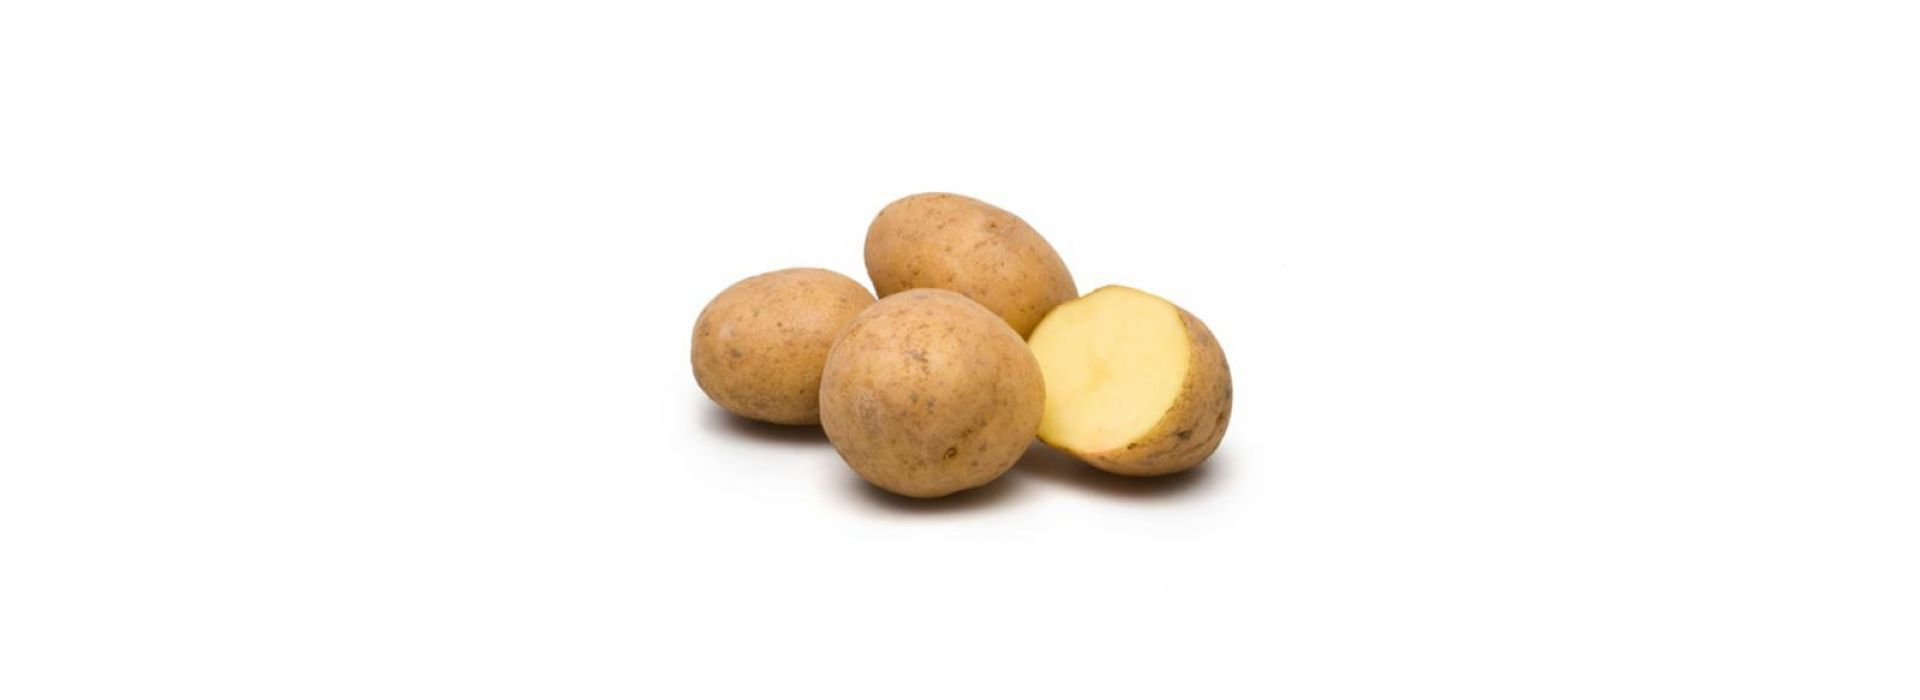 Potatoes Agata